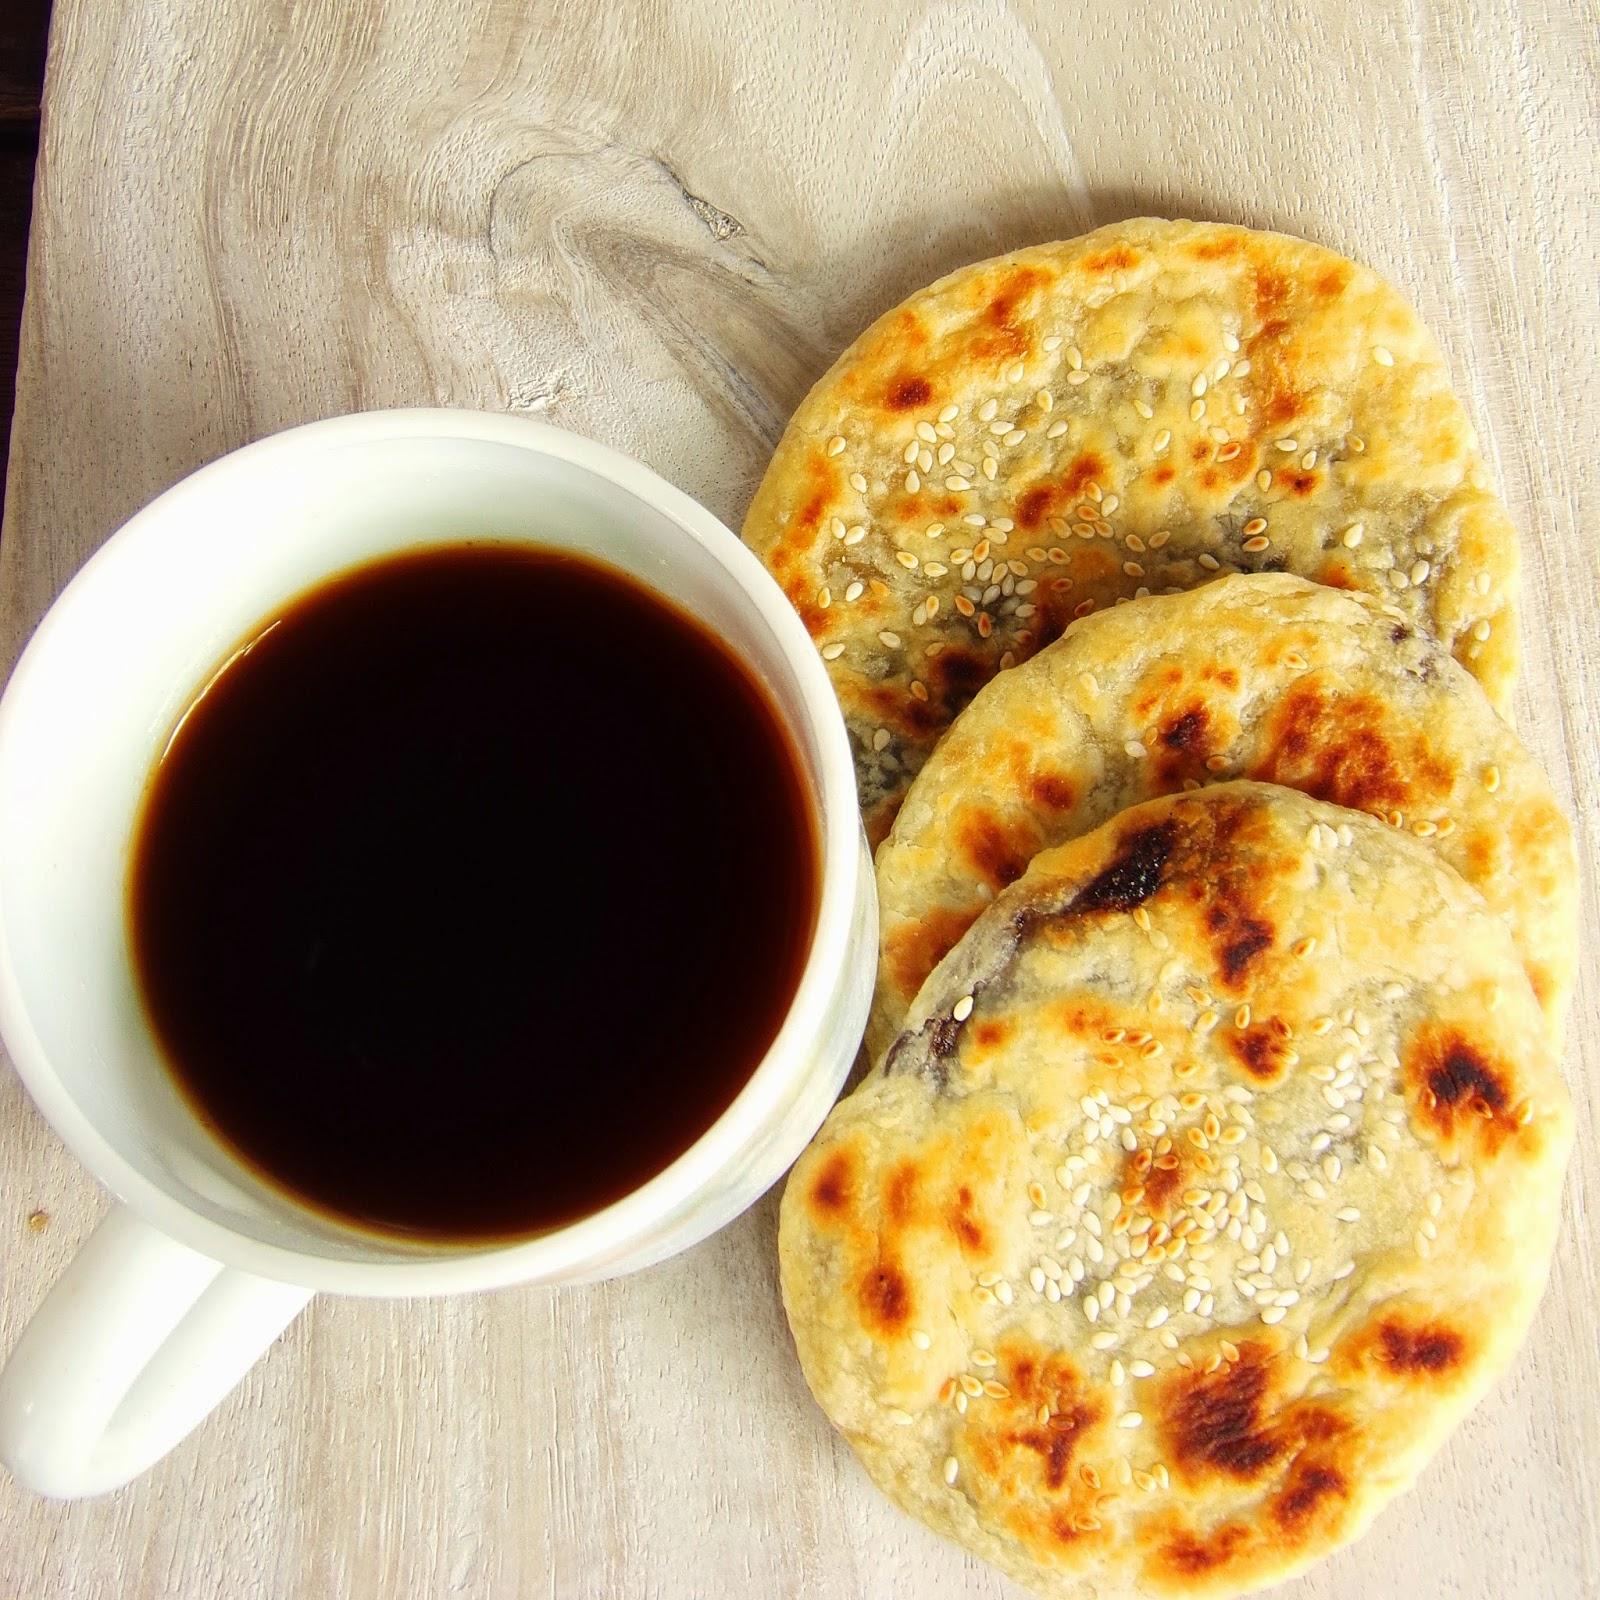 how to make unleavened bread, flat bread recipes, how to make flatbread, recipe for flatbread